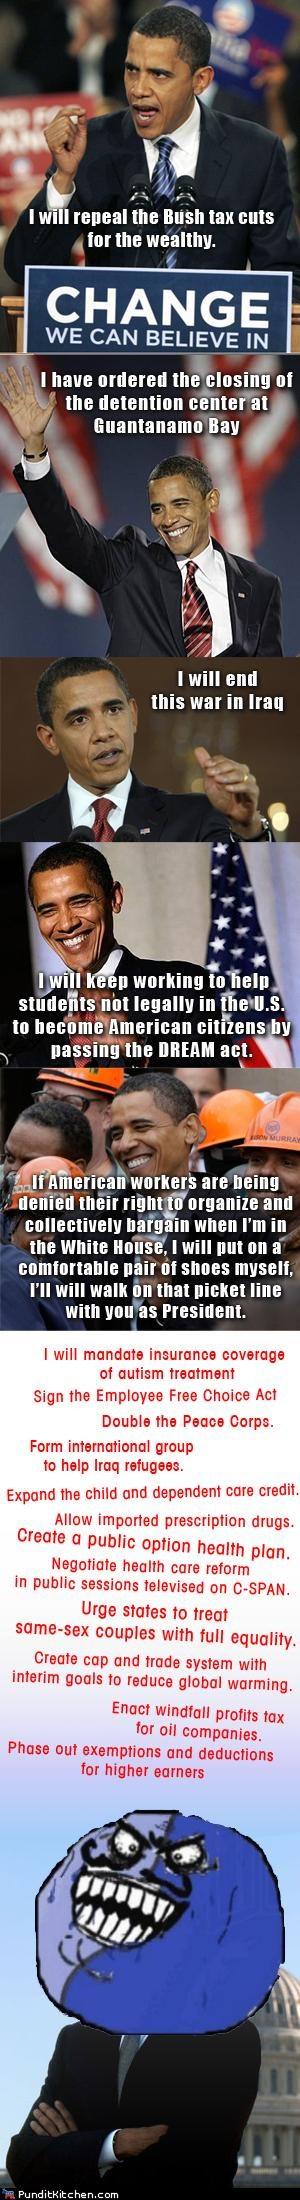 barack obama,political pictures,promises